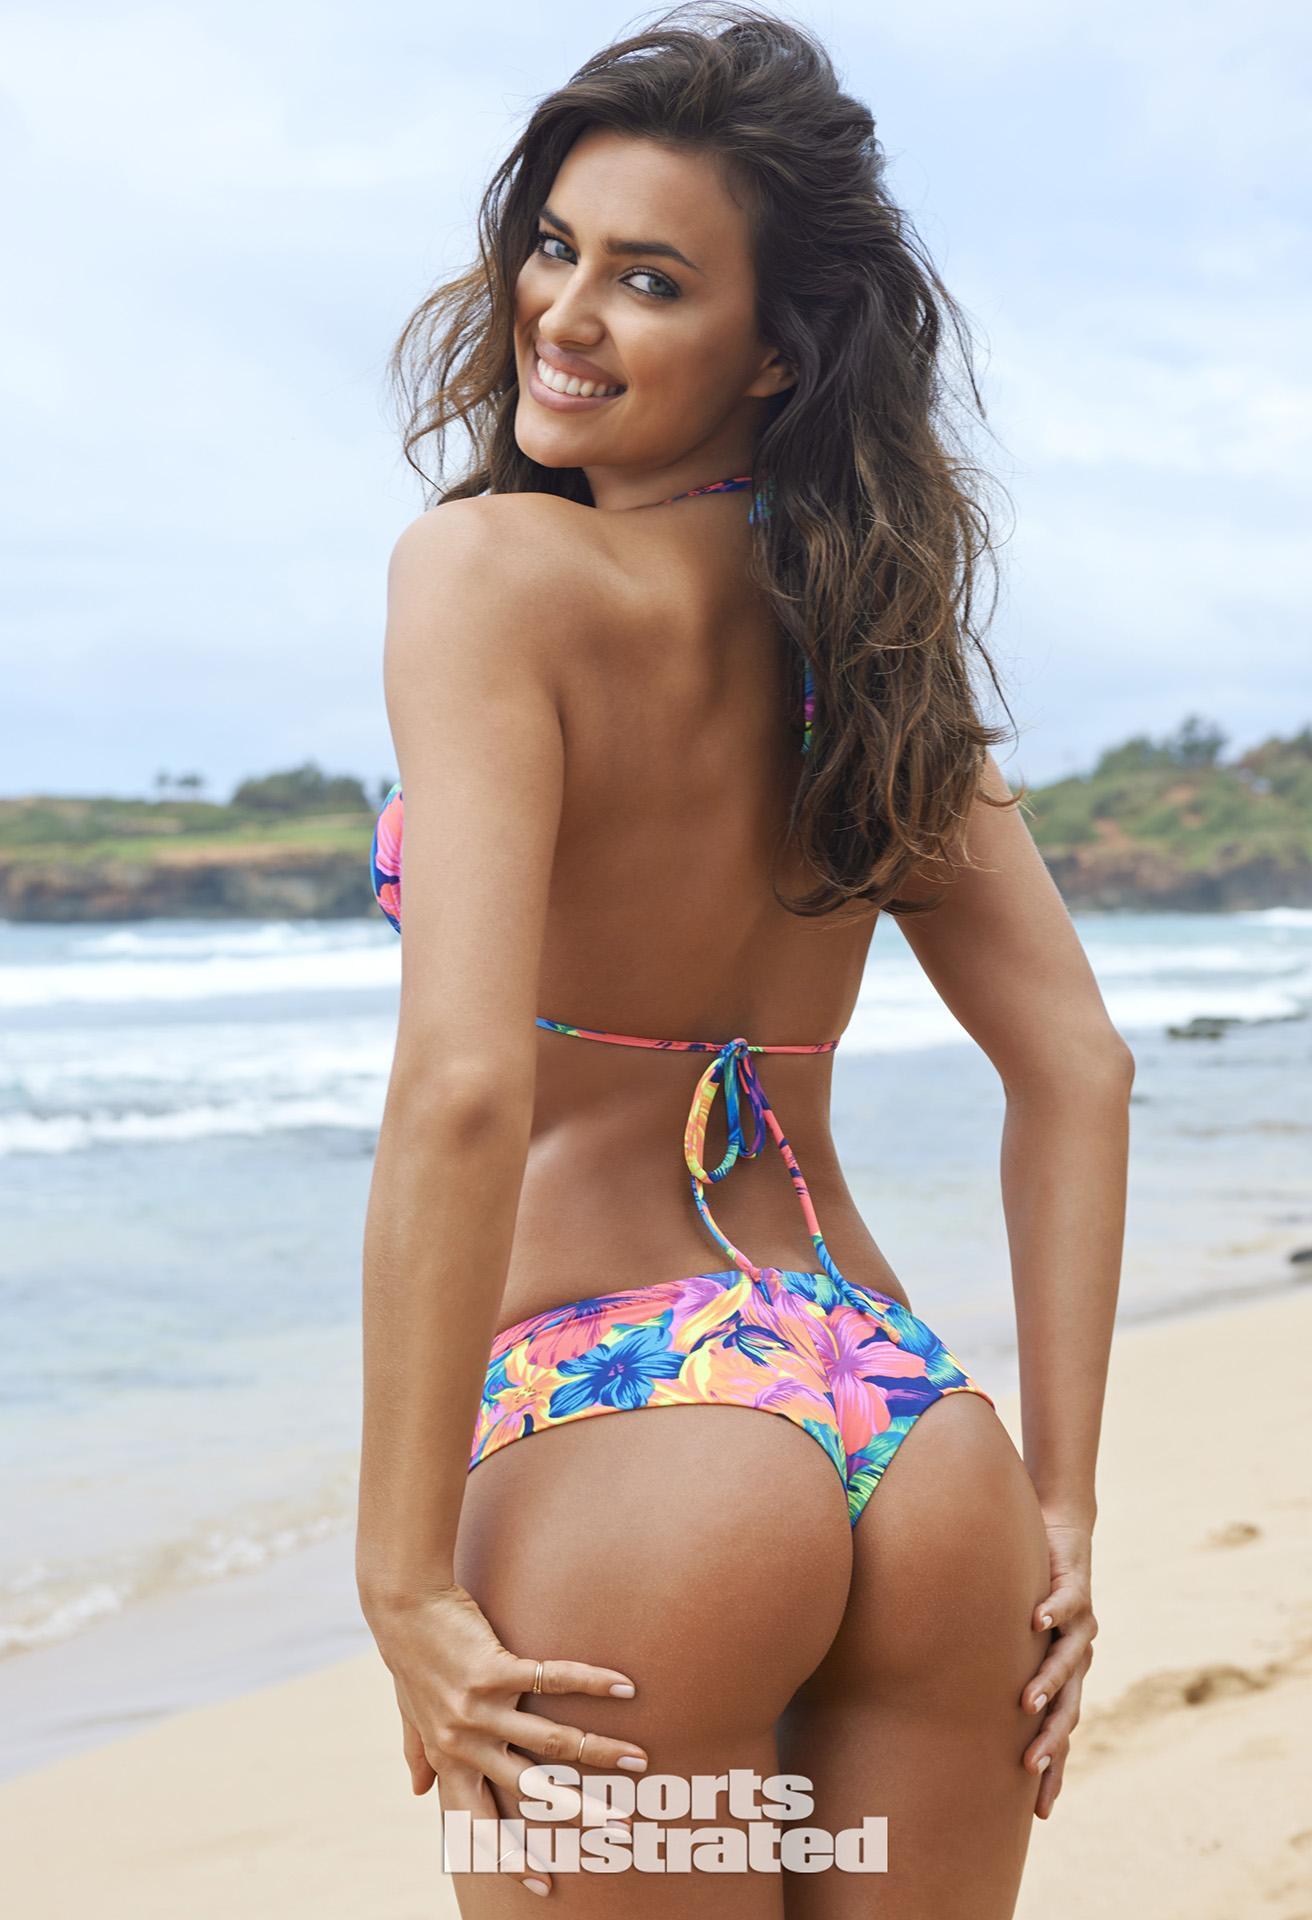 Bikini Porno Nusrat Jahan  nude (31 images), Twitter, underwear